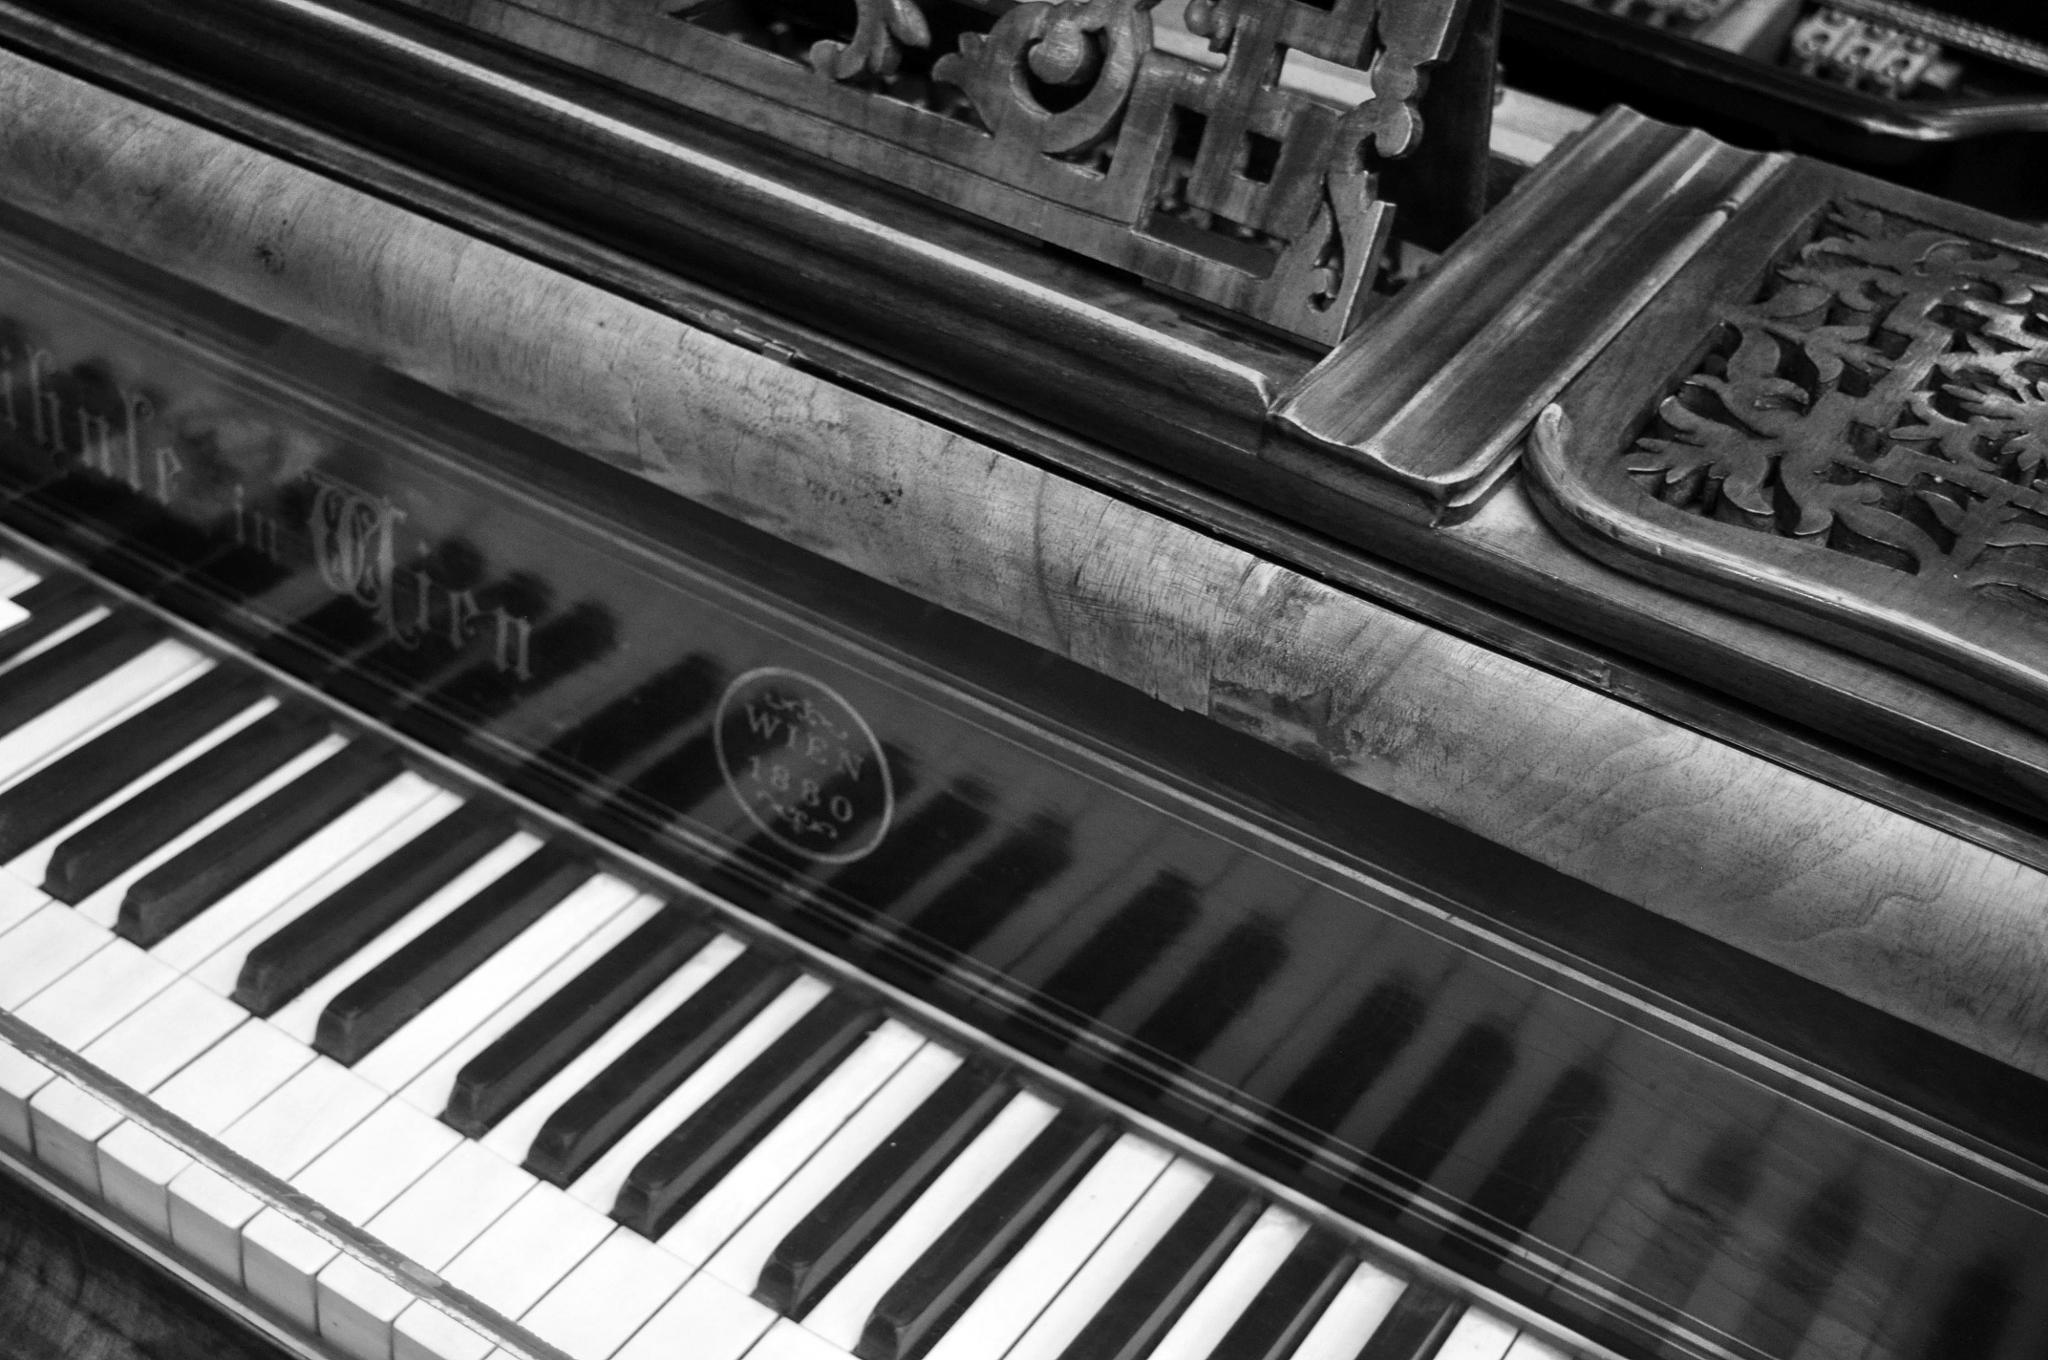 Piano piano. by Emrah Demir